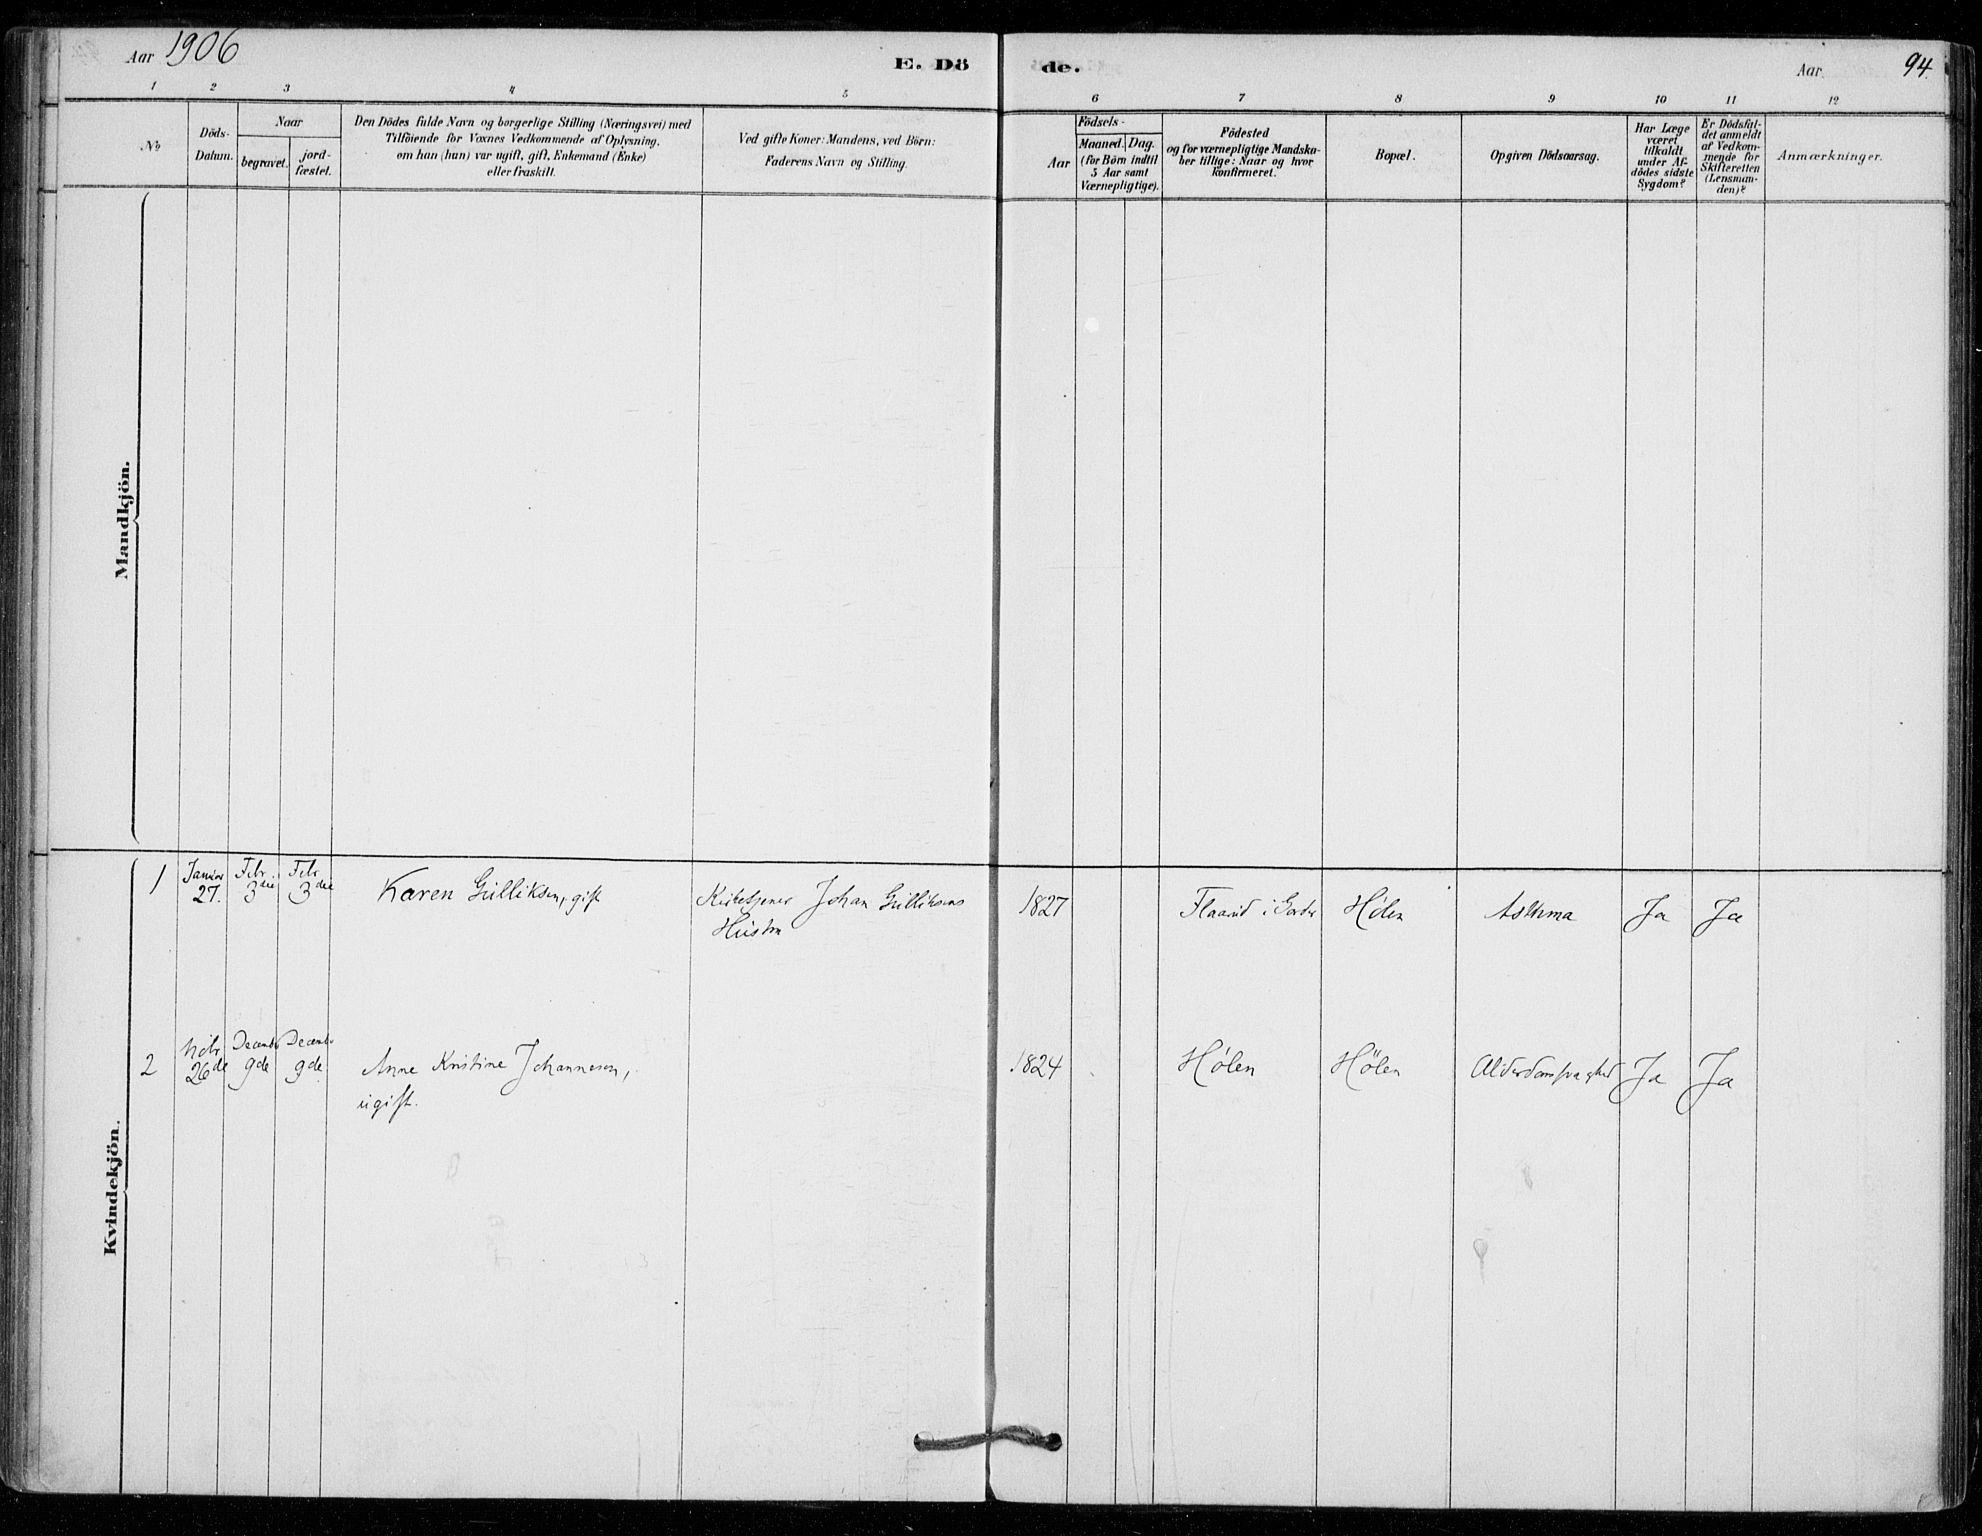 SAO, Vestby prestekontor Kirkebøker, F/Fe/L0001: Ministerialbok nr. V 1, 1878-1931, s. 94